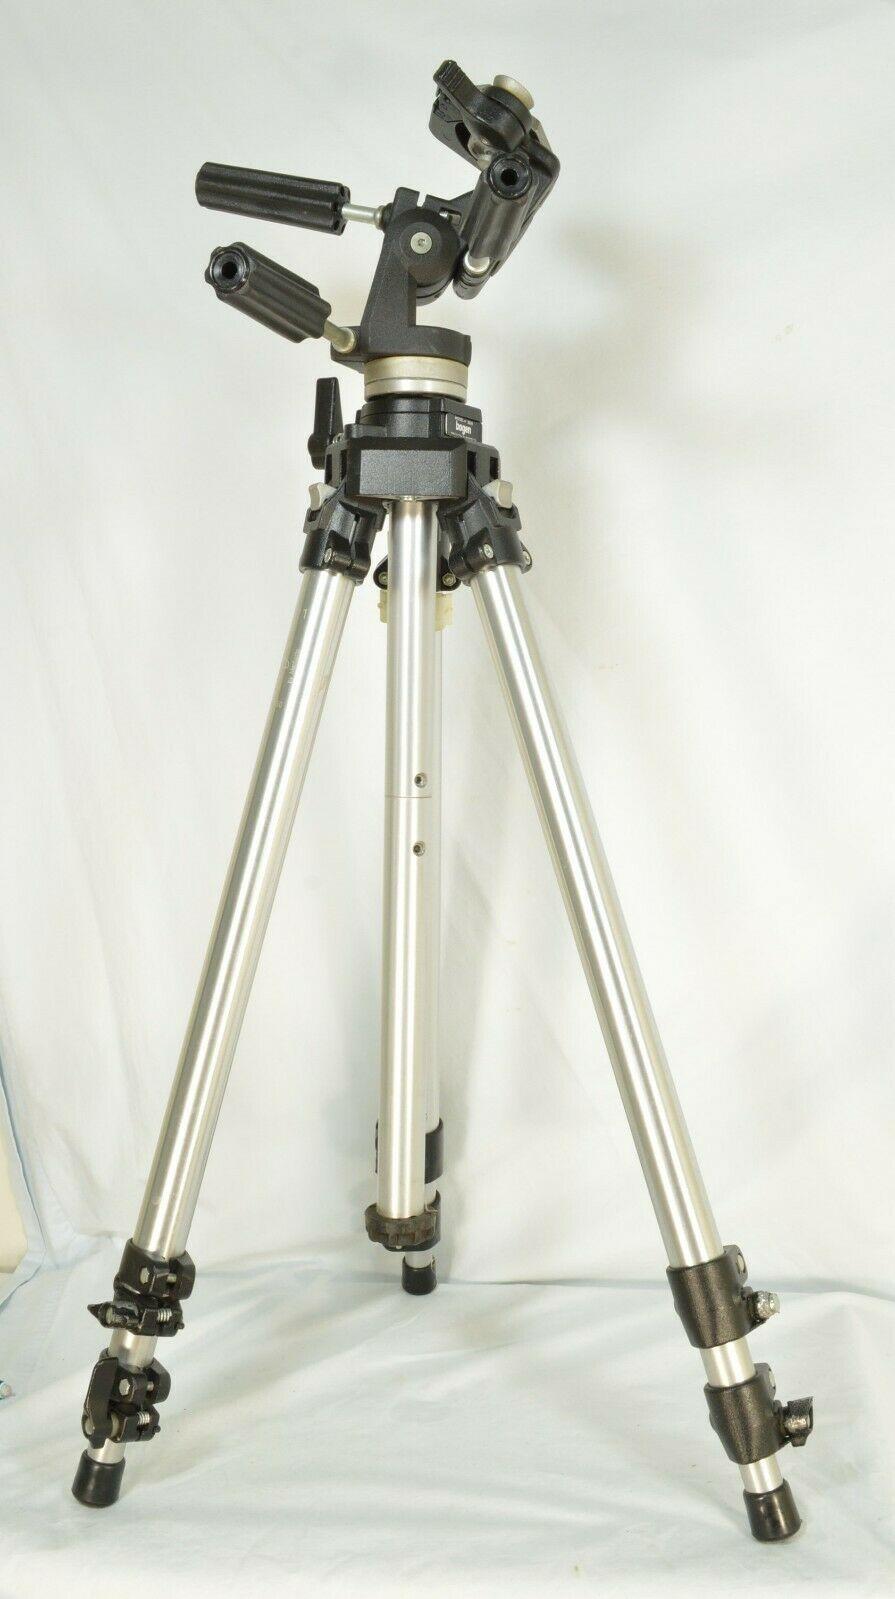 Manfrotto Bogen 3021 pro camera tripod +3047 Deluxe 3-way Pan/tilt Head image 10